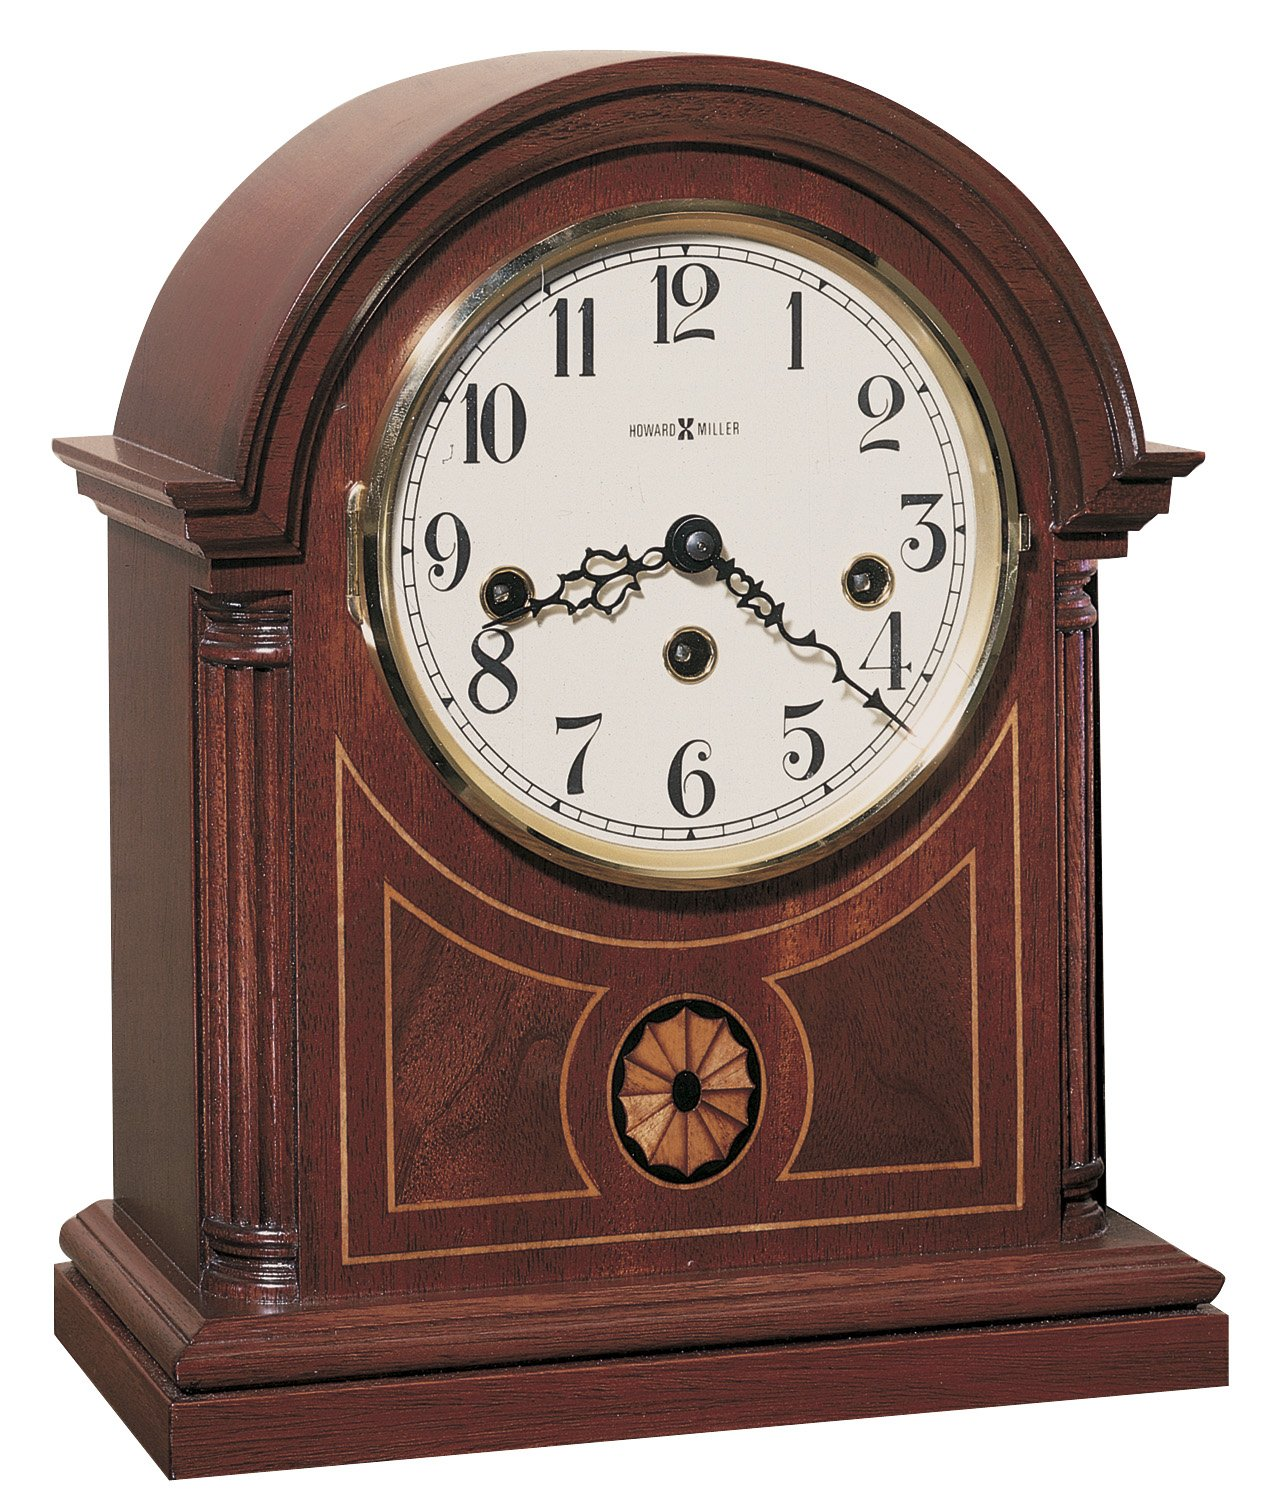 Howard Miller 613-180 Barrister Mantel Clock by Howard Miller